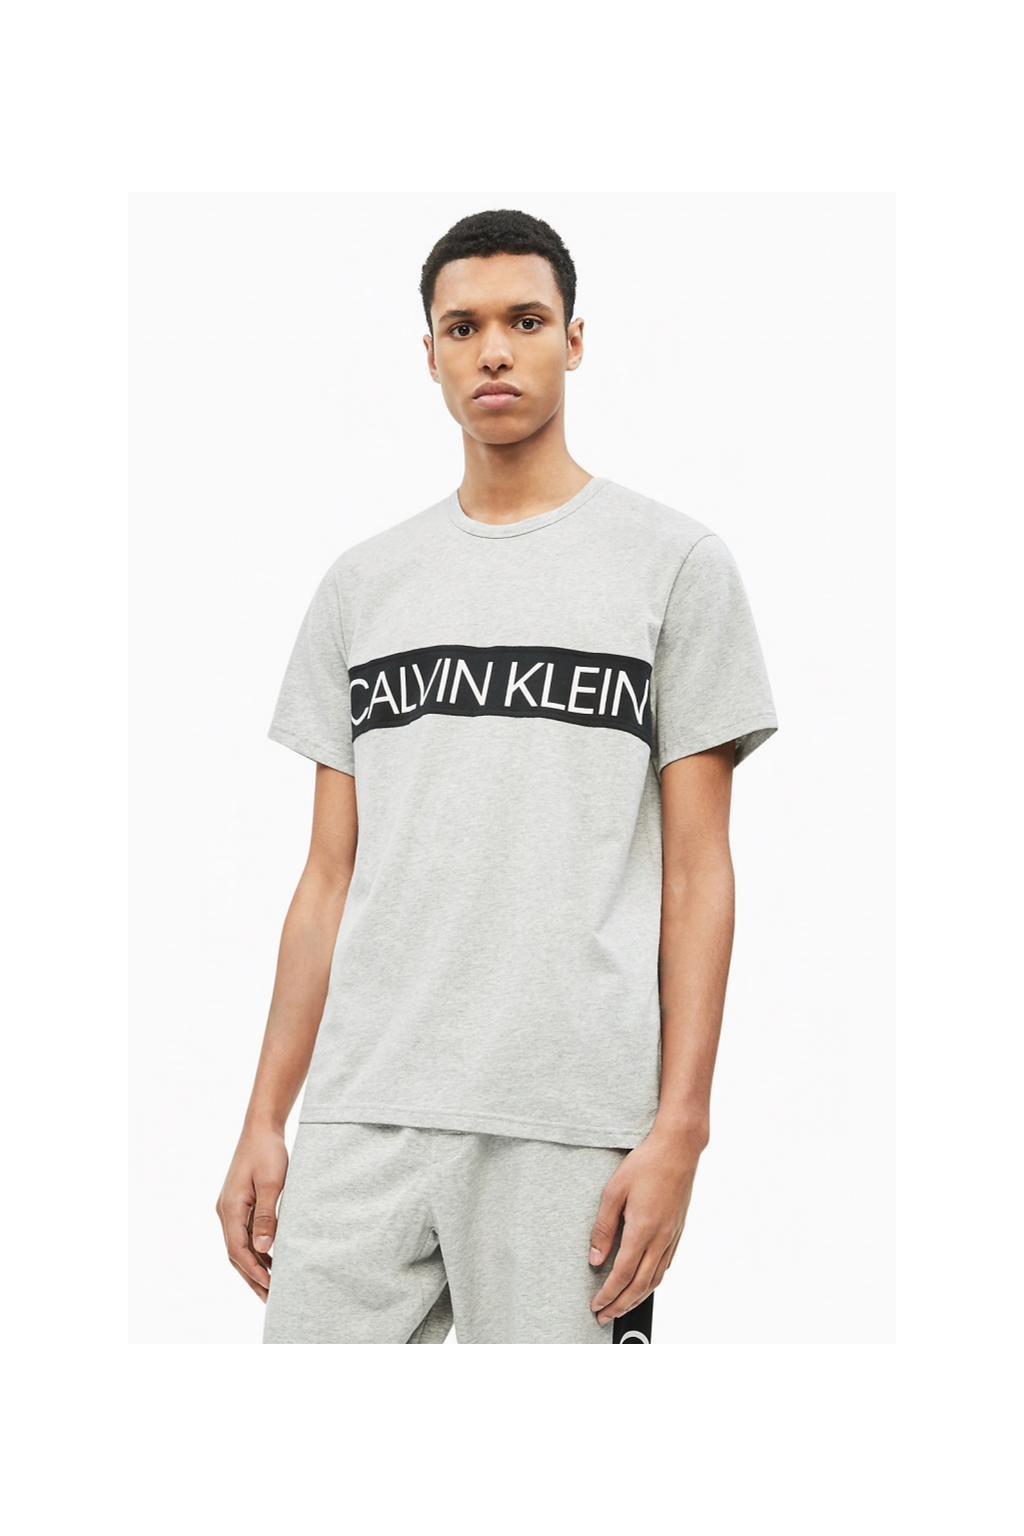 Calvin Klein Statement Tričko - šedé